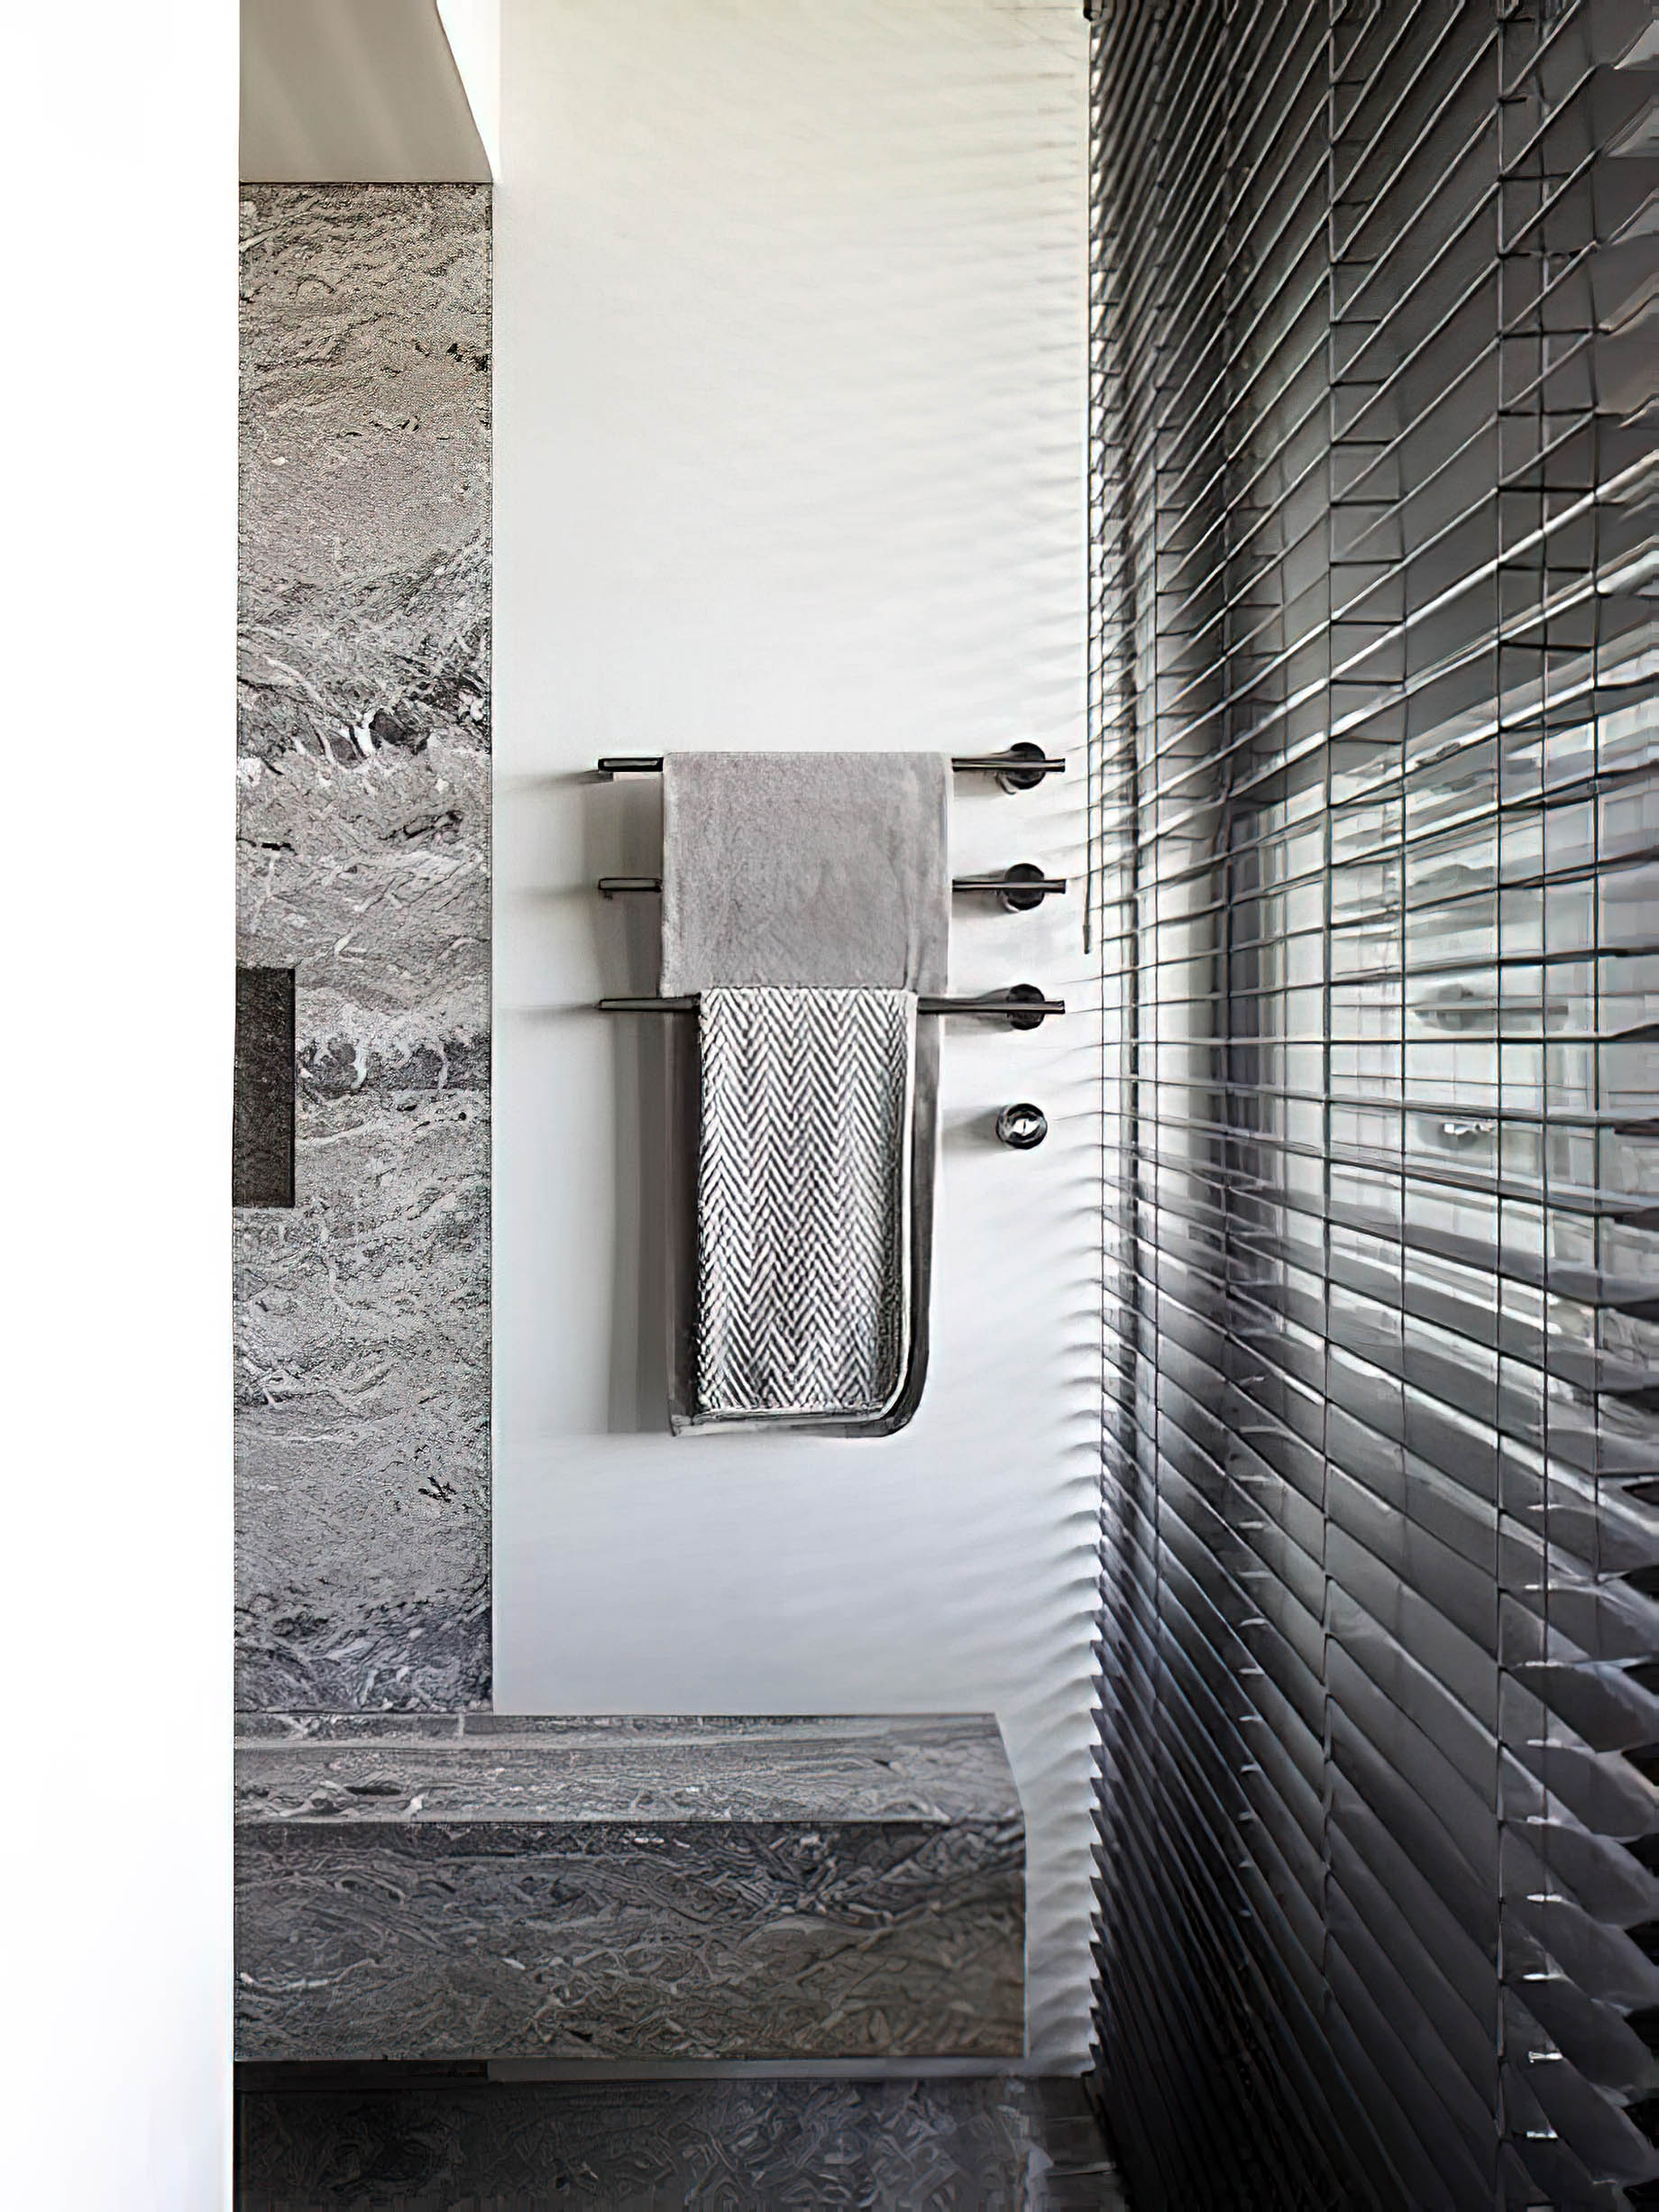 High Luxury Apartment Interior Amsterdam, Netherlands – Studio Piet Boon